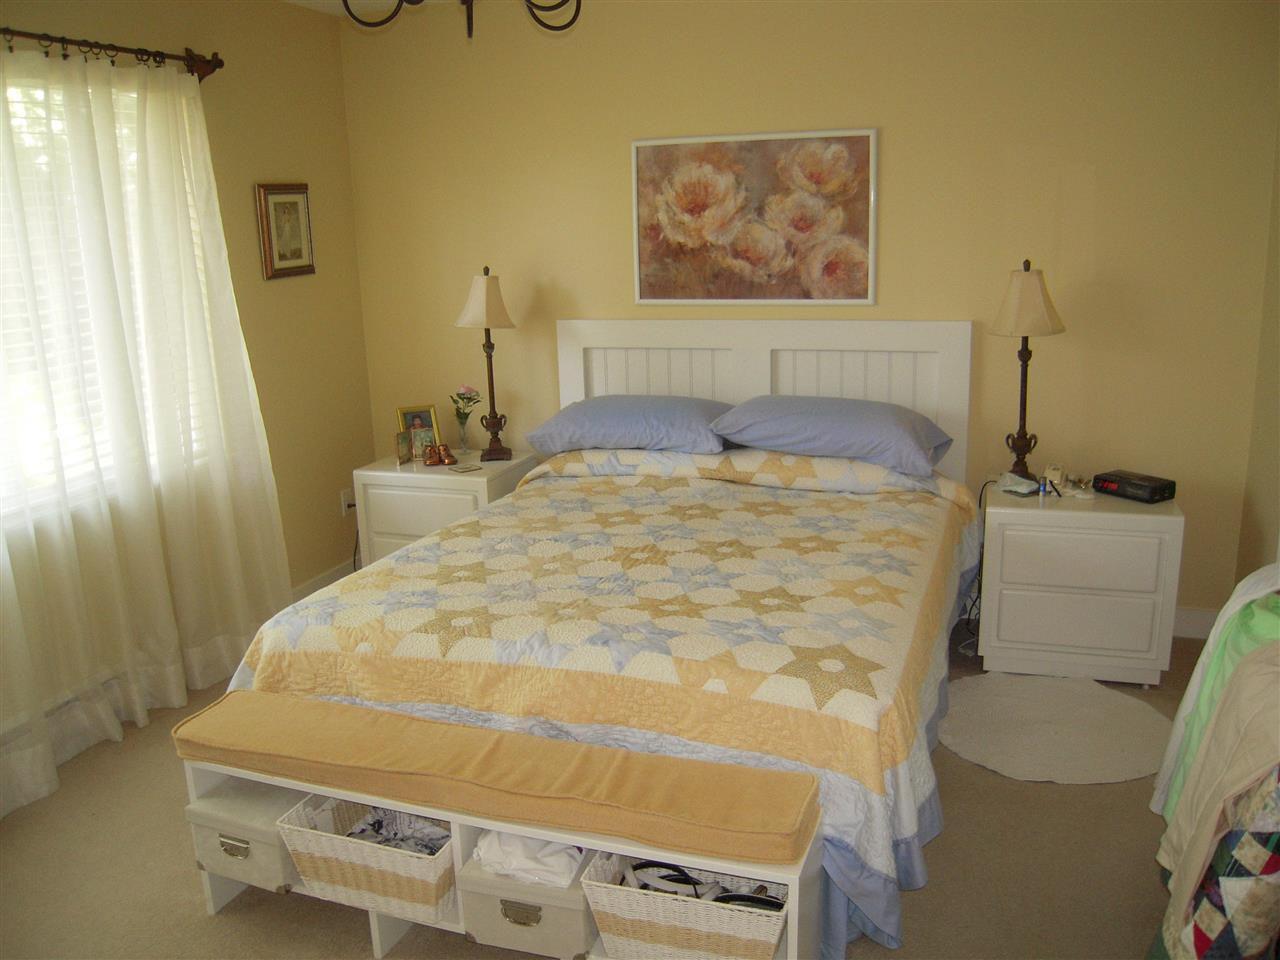 Photo 15: Photos: 5735 EMILY Way in Sechelt: Sechelt District House for sale (Sunshine Coast)  : MLS®# R2179124